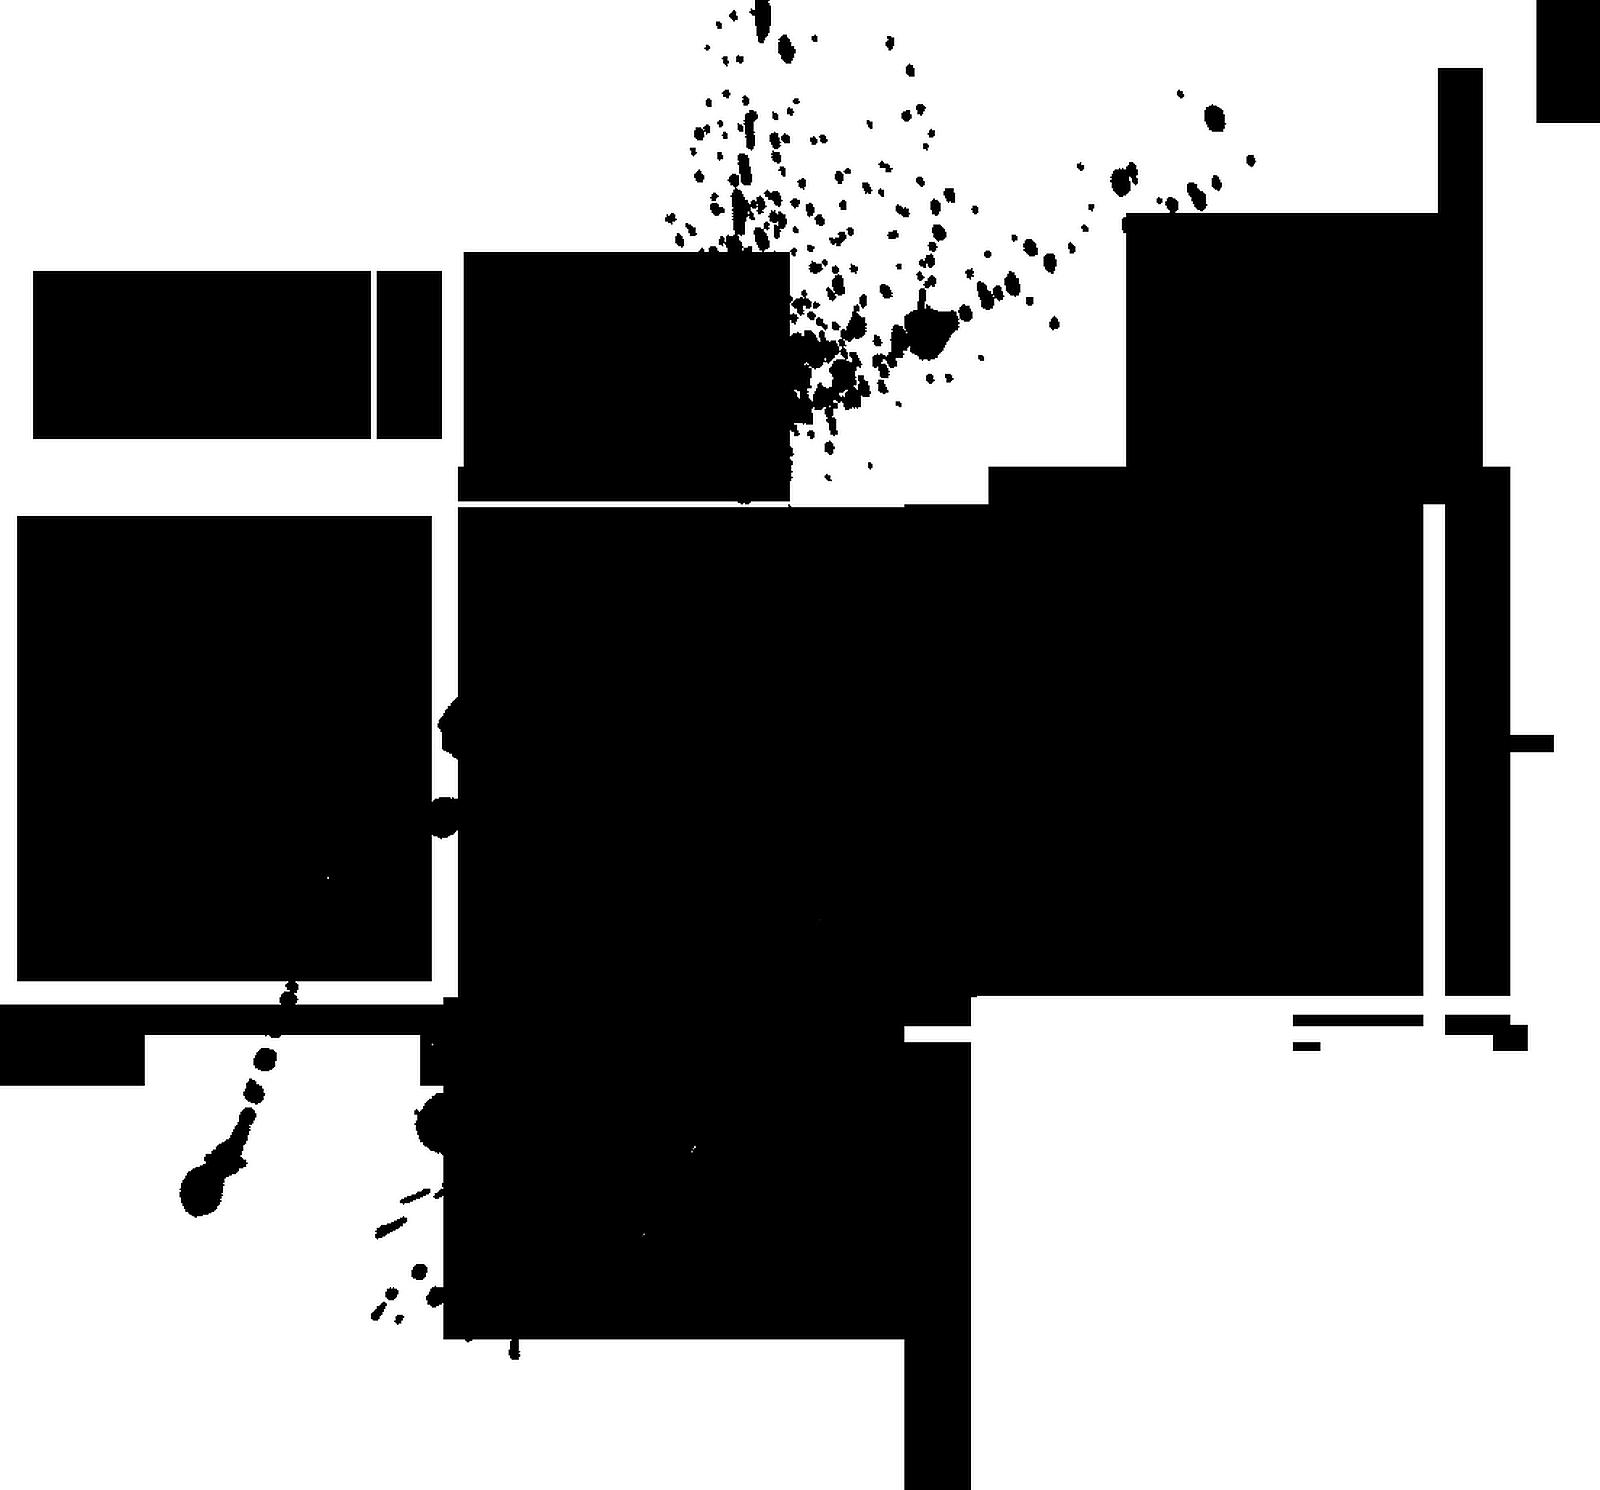 Клипарт ресницы на прозрачном фоне